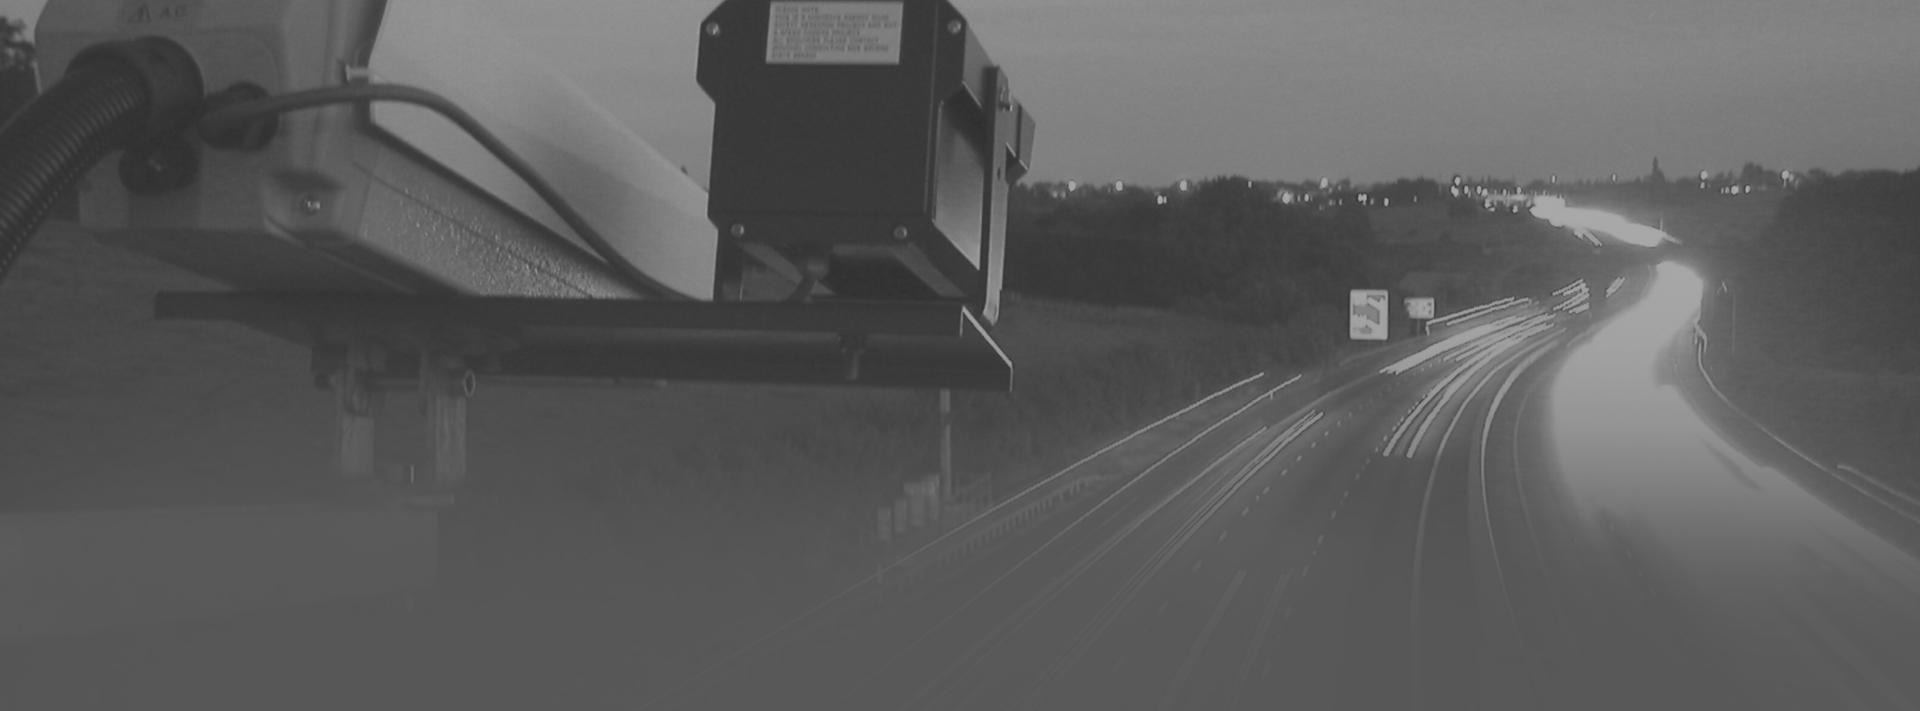 Roadway CCTV